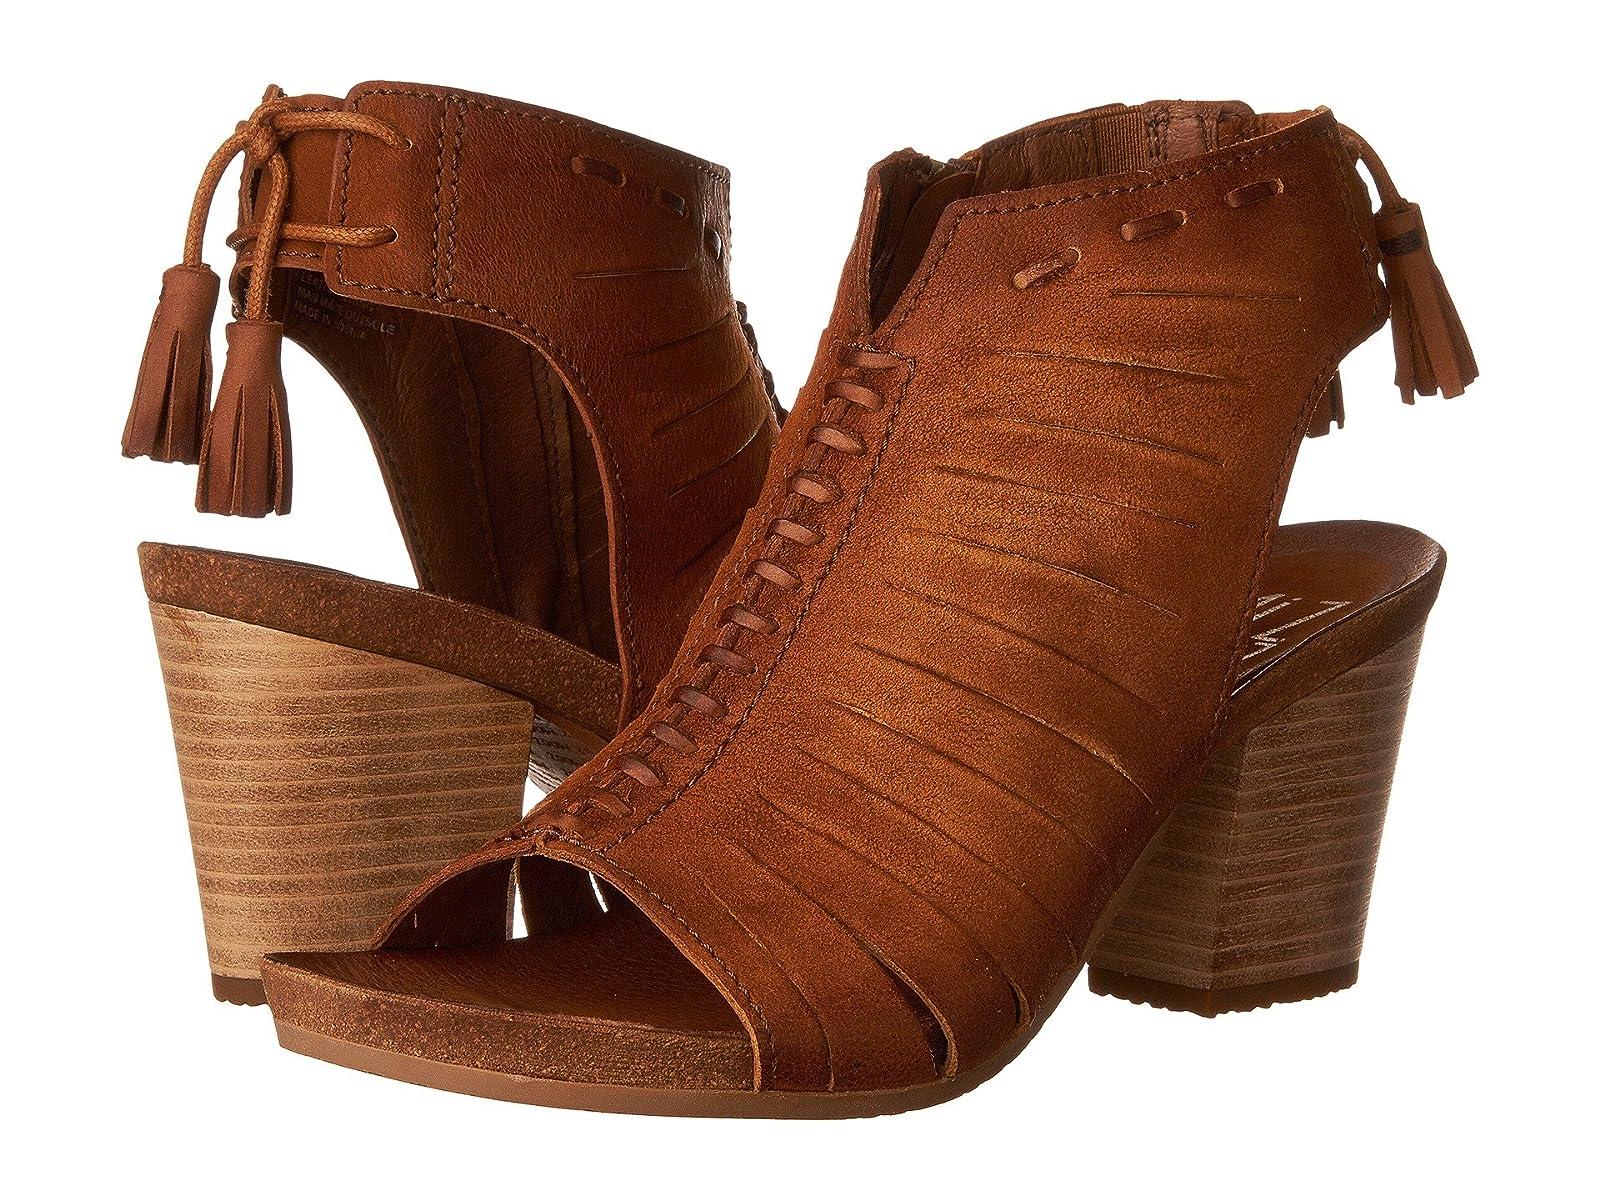 Miz Mooz MaddieCheap and distinctive eye-catching shoes